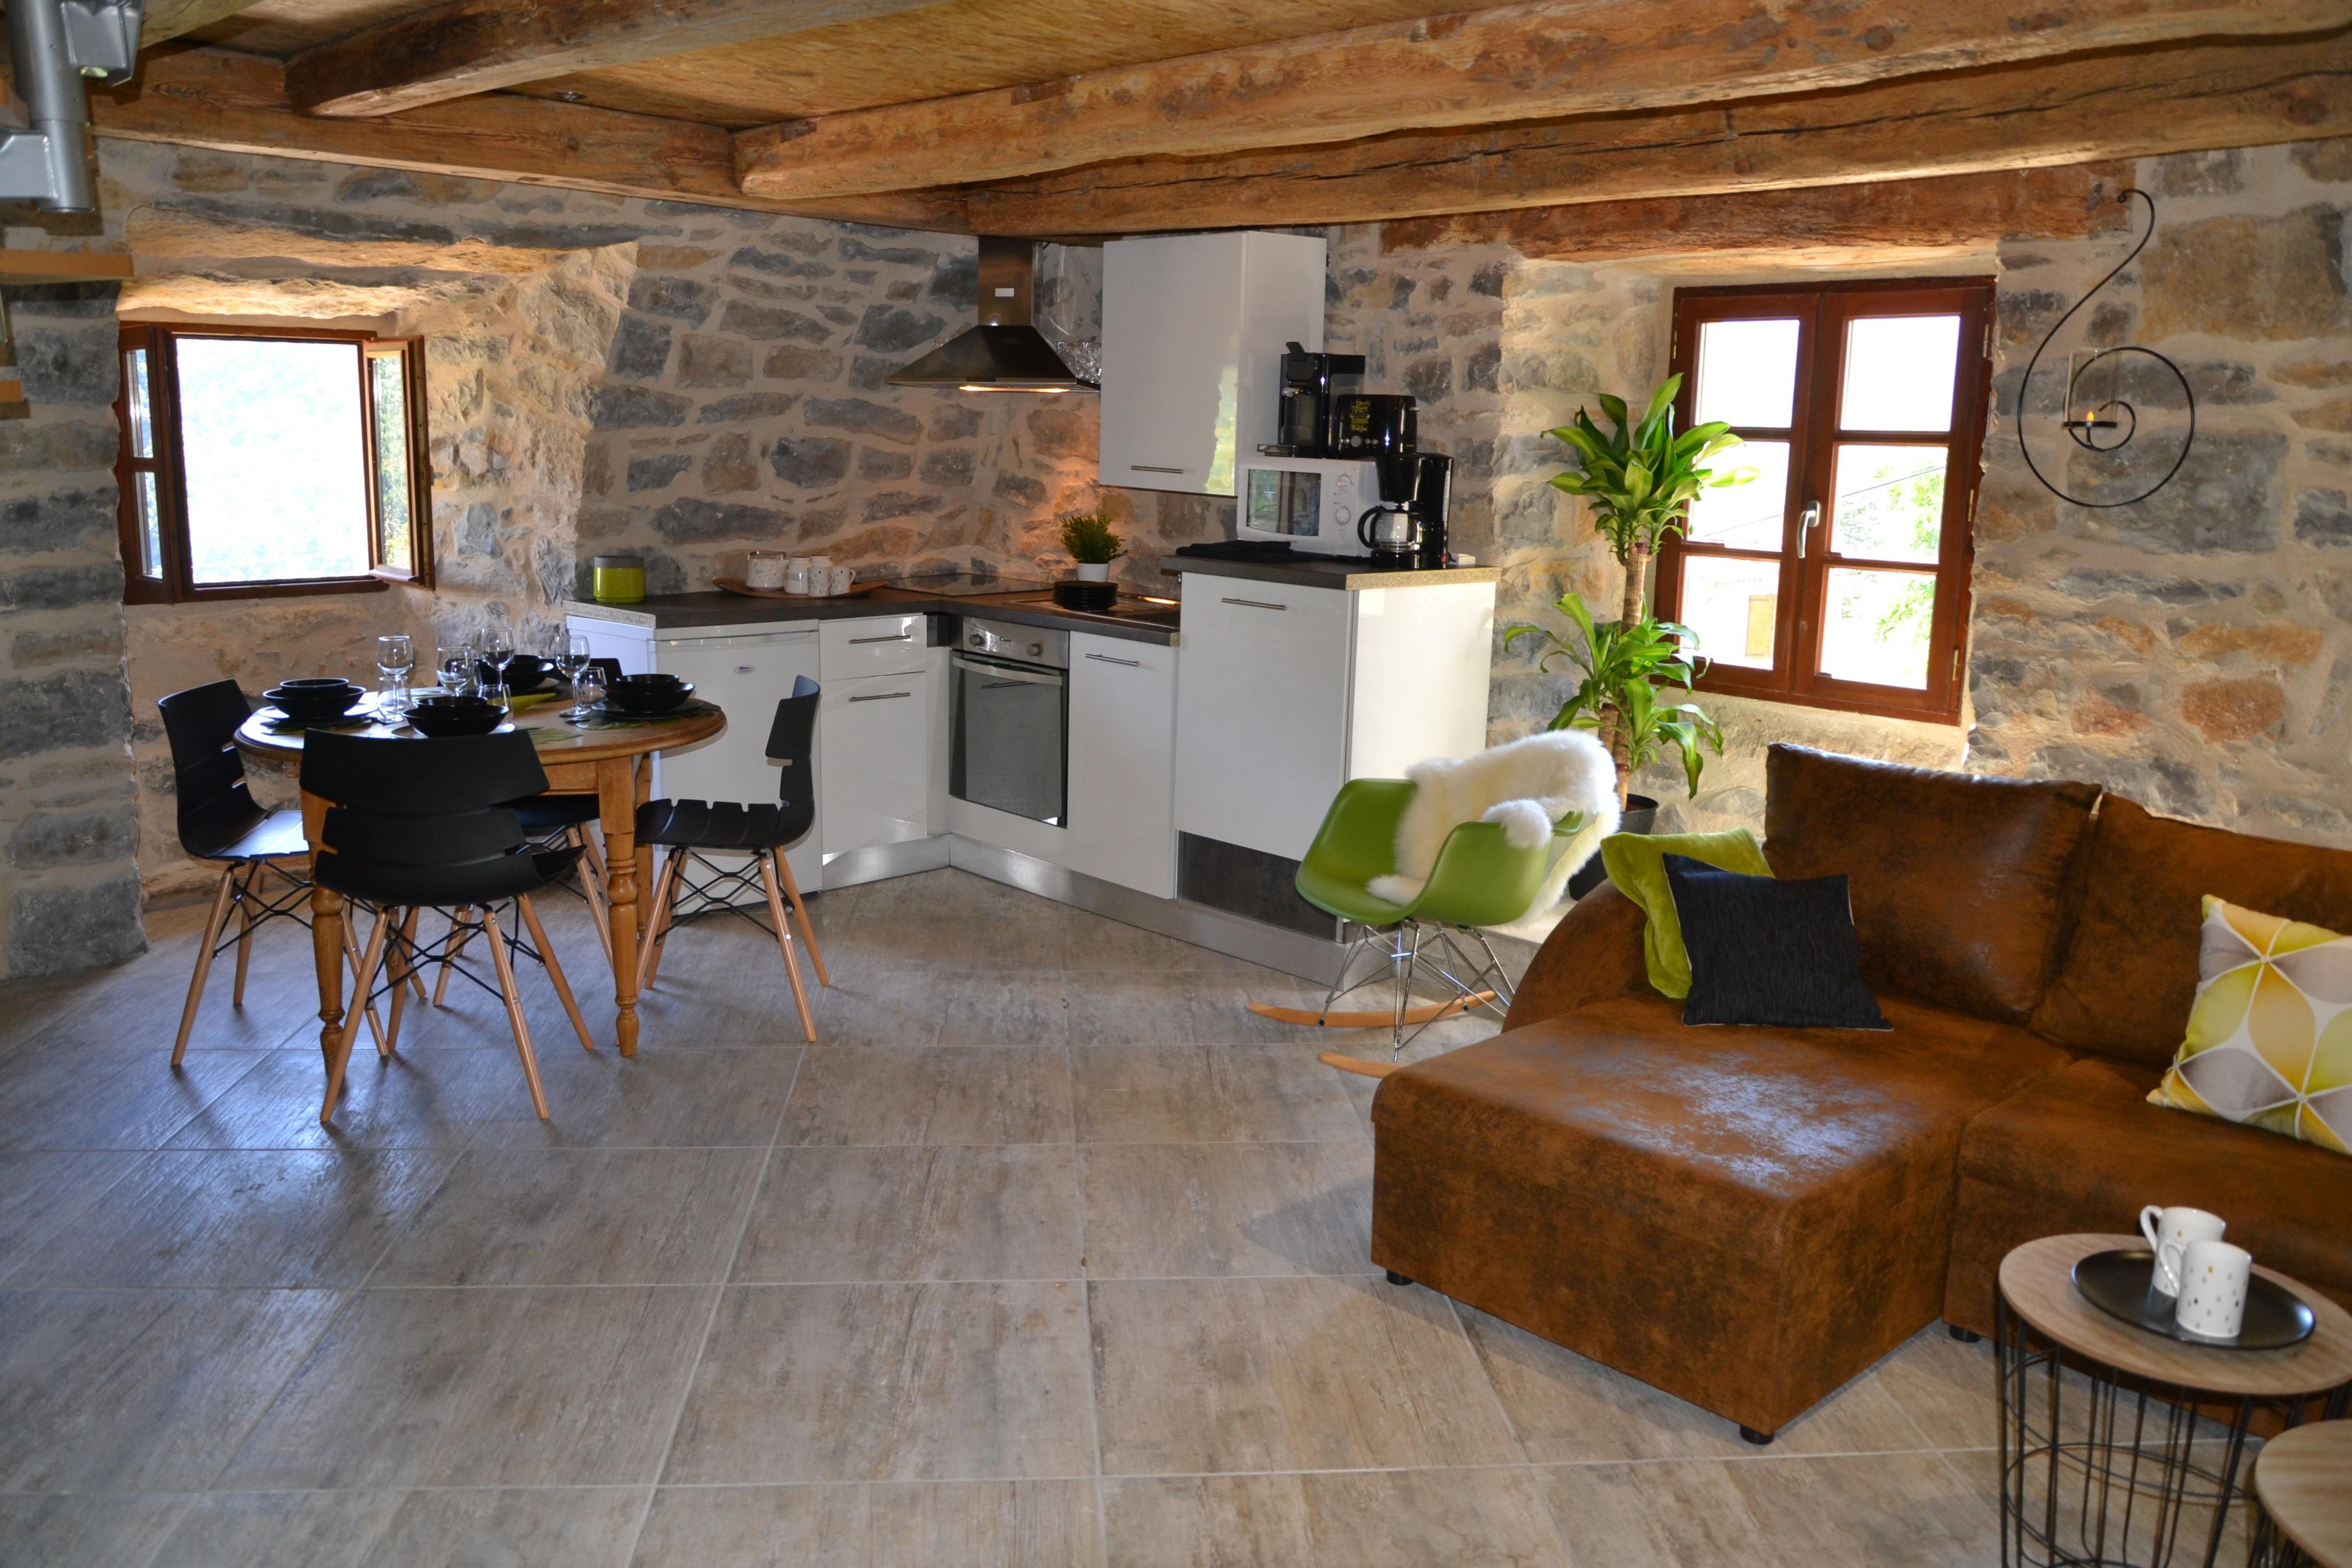 Gite Insolite Original Et Design En Duplex Avec Cuisine Equipee Et Salon Cosy Gite Insolite Gite Hebergement Insolite